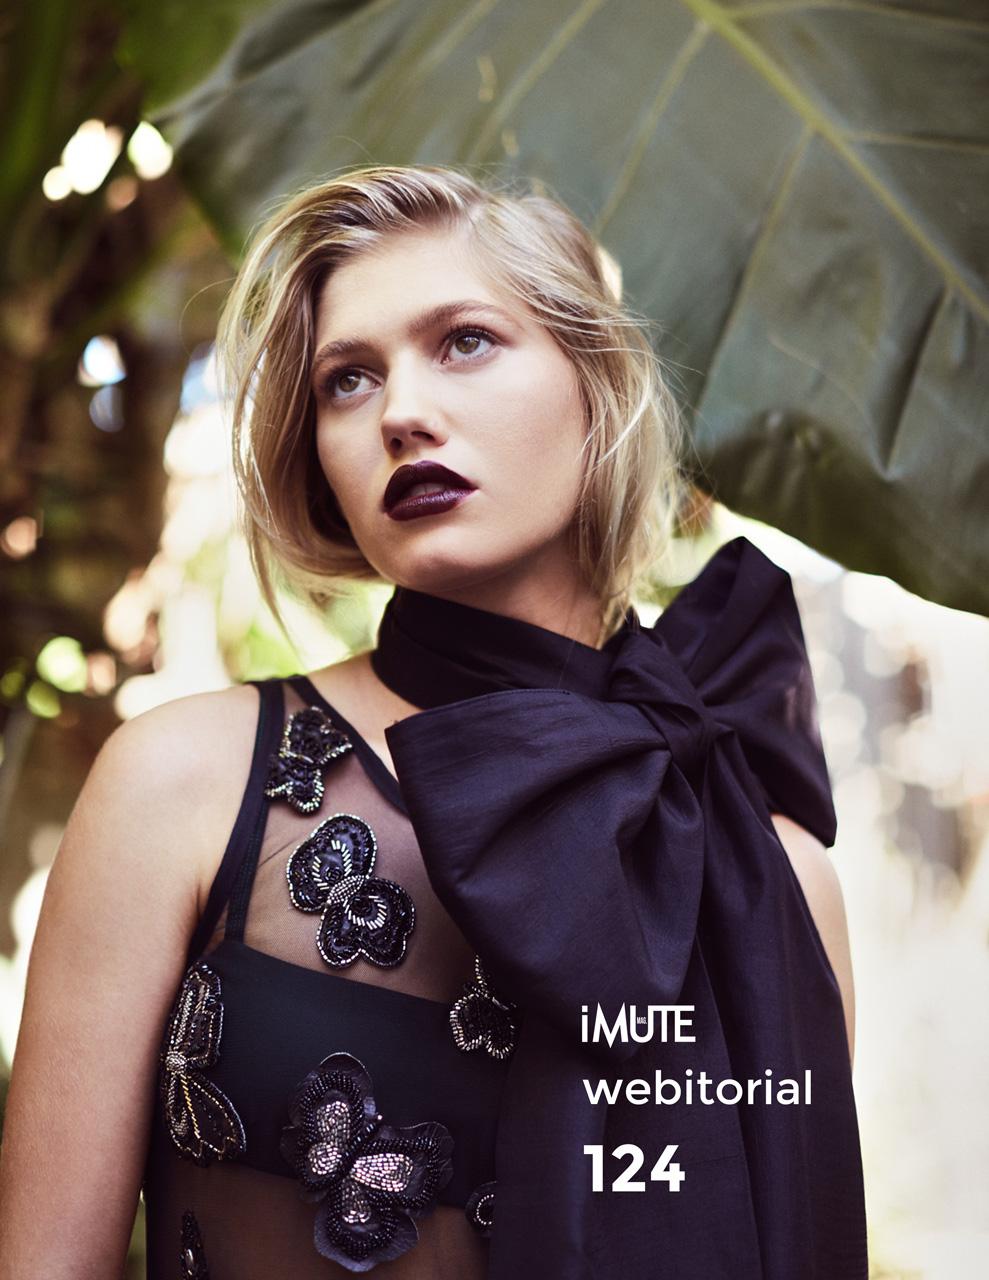 Greta webitorial for iMute Magazine Photographer|Anastasia Fua Model| Greta @Vivien's Models Stylist|Emma Cotterill @ Reload Agency Makeup & Hair|Rachelle Facelo